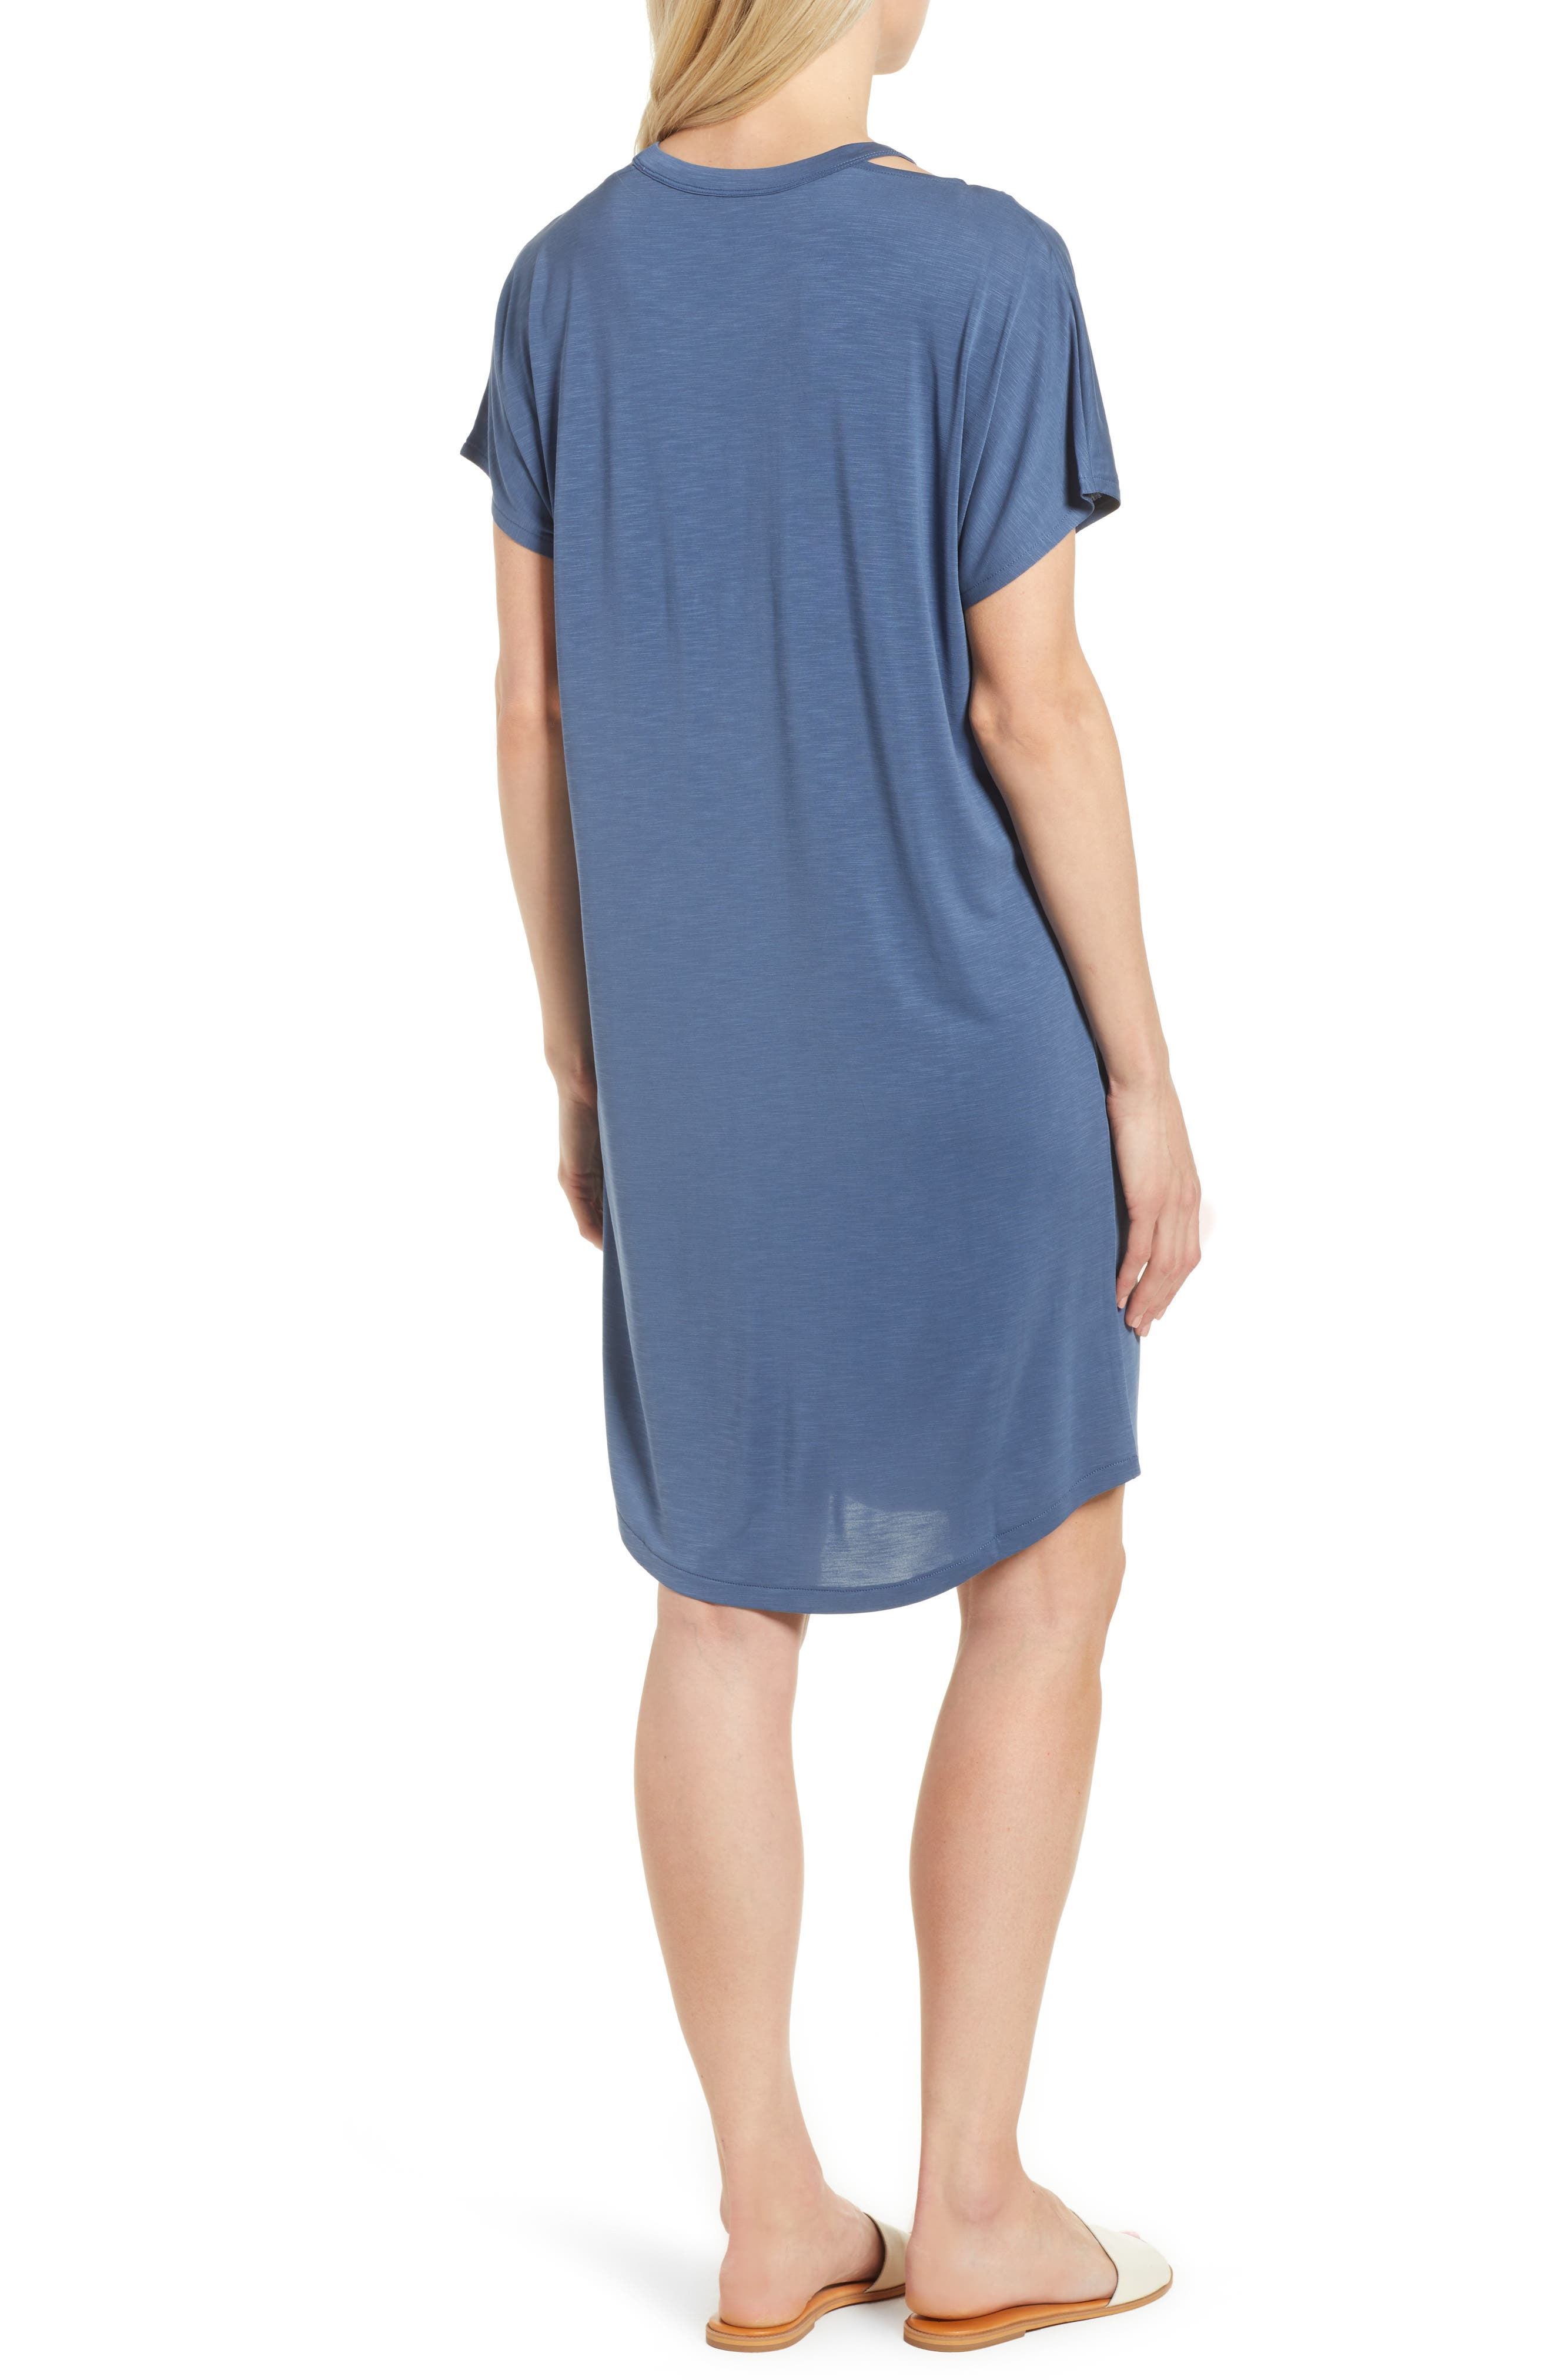 Open Road Dress,                             Alternate thumbnail 2, color,                             490